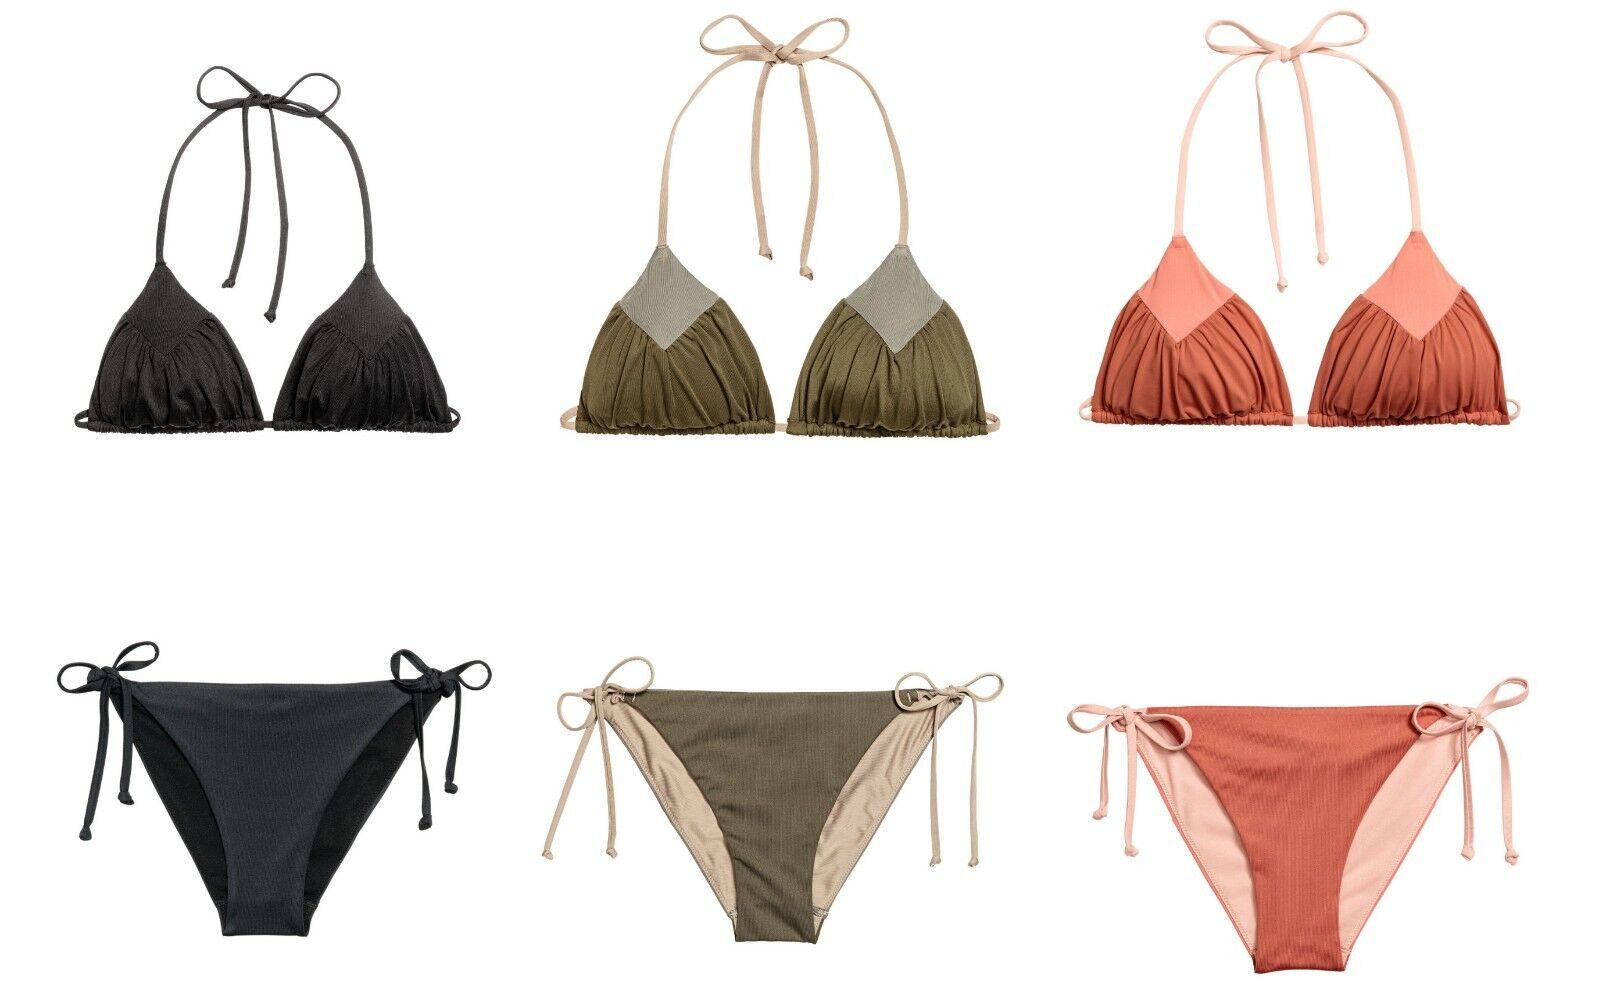 NEU H&M Triangle Neckholder Bikini schwarz khaki rost 36 38 40 Raffung Schnürung